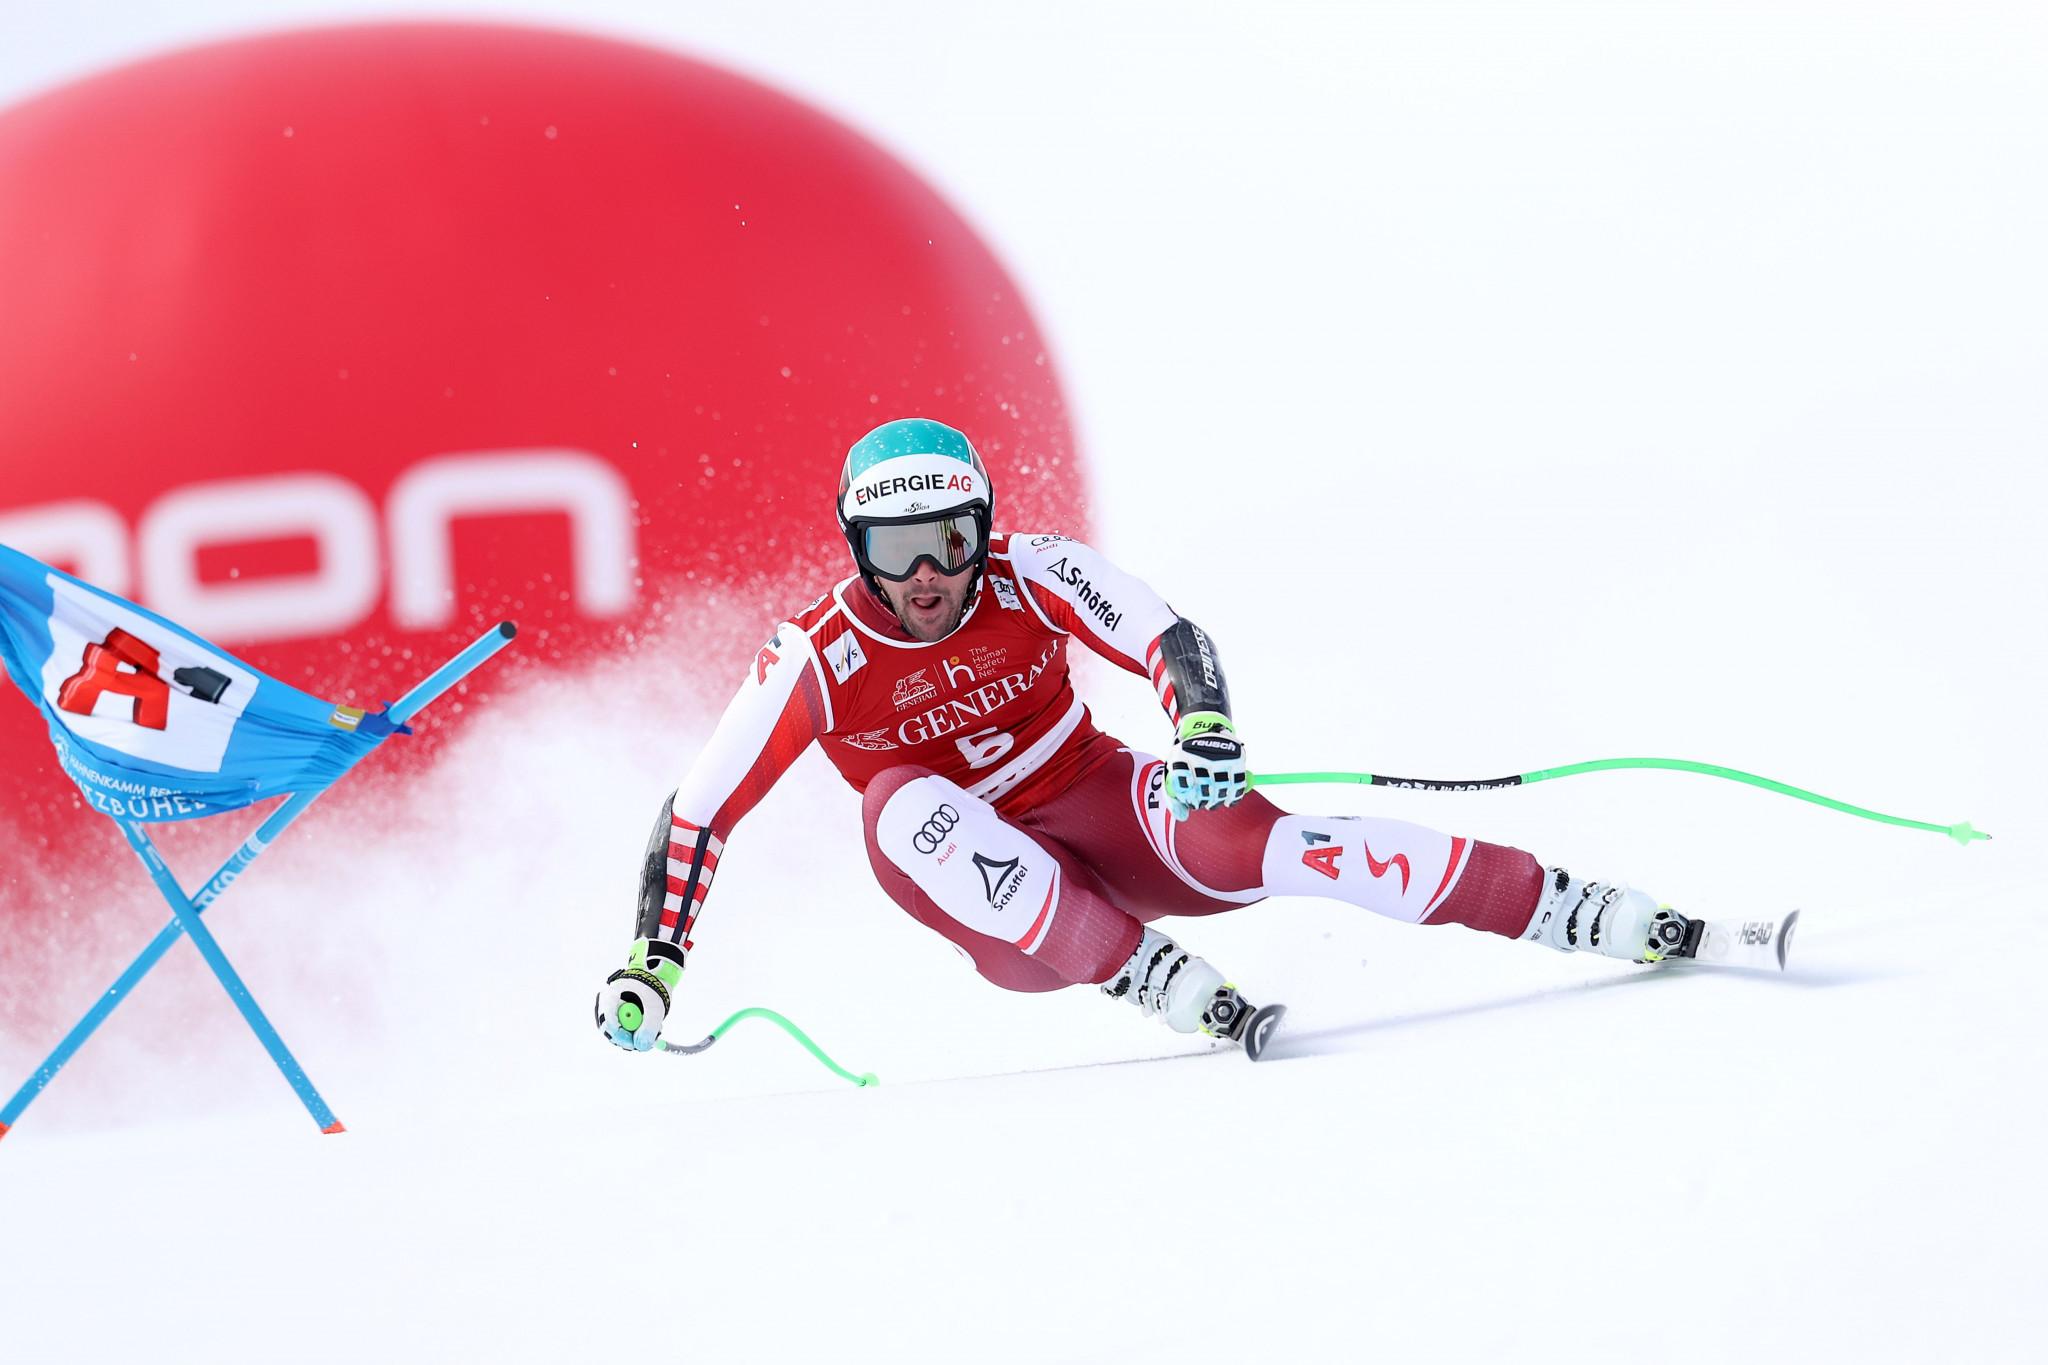 Kriechmayr earns first win of FIS Alpine Skiing World Cup season in Kitzbühel